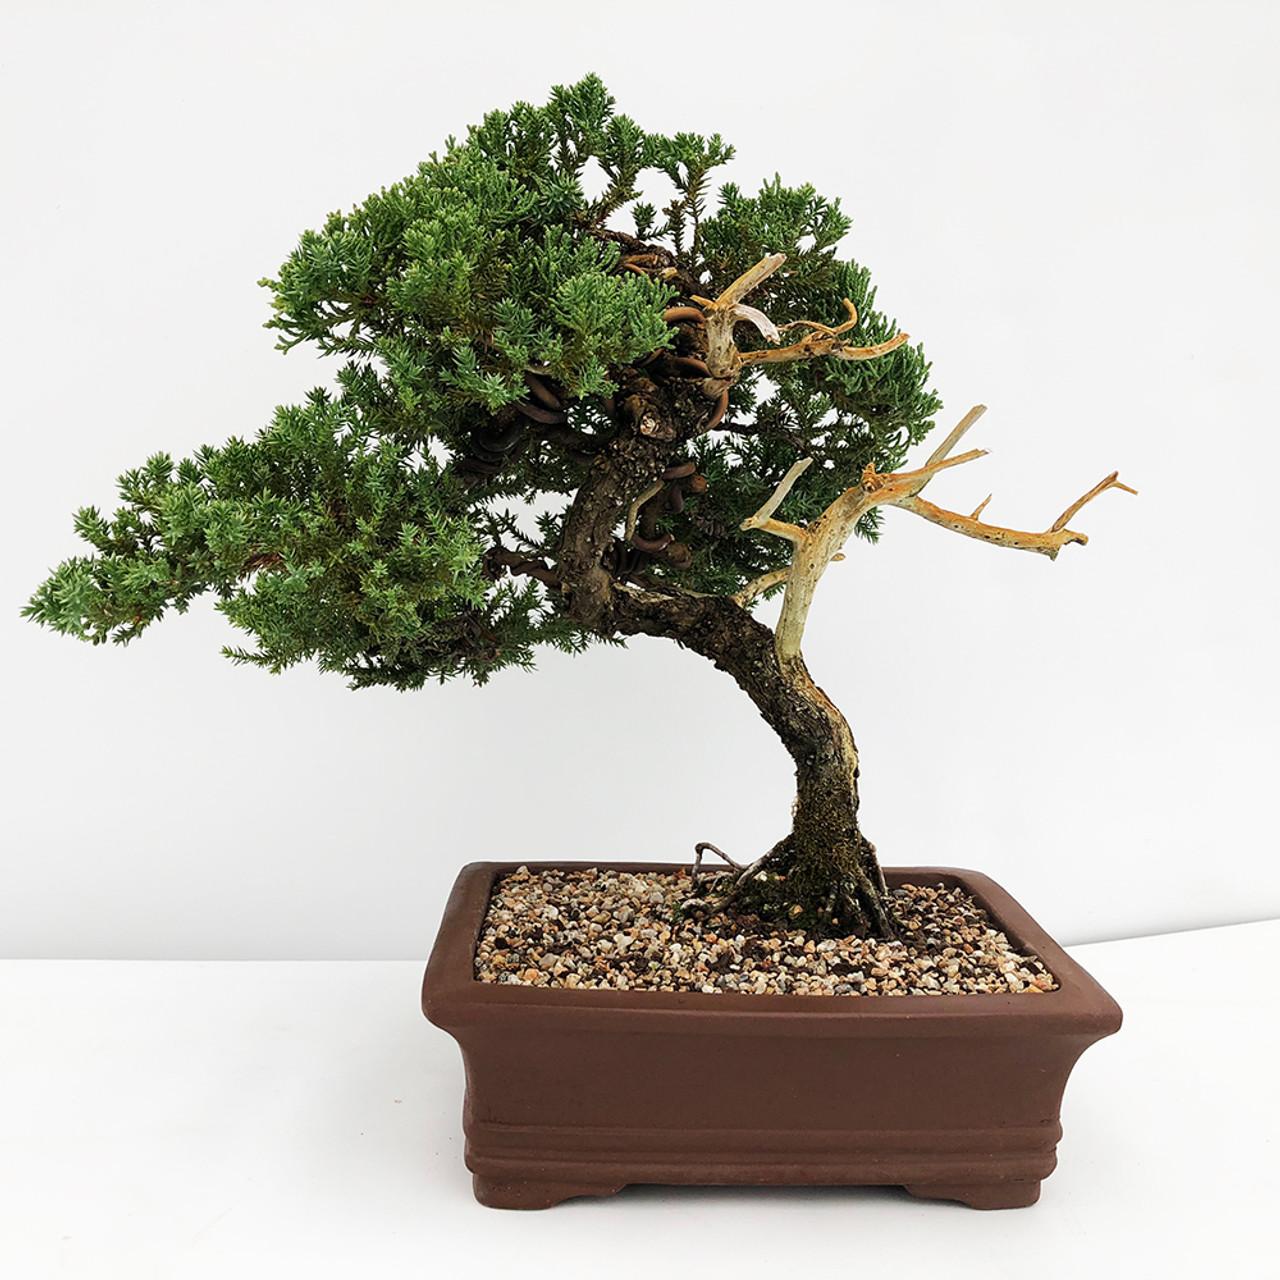 Old Juniper With Deadwood Bonsai Tree I Bonsai Outlet